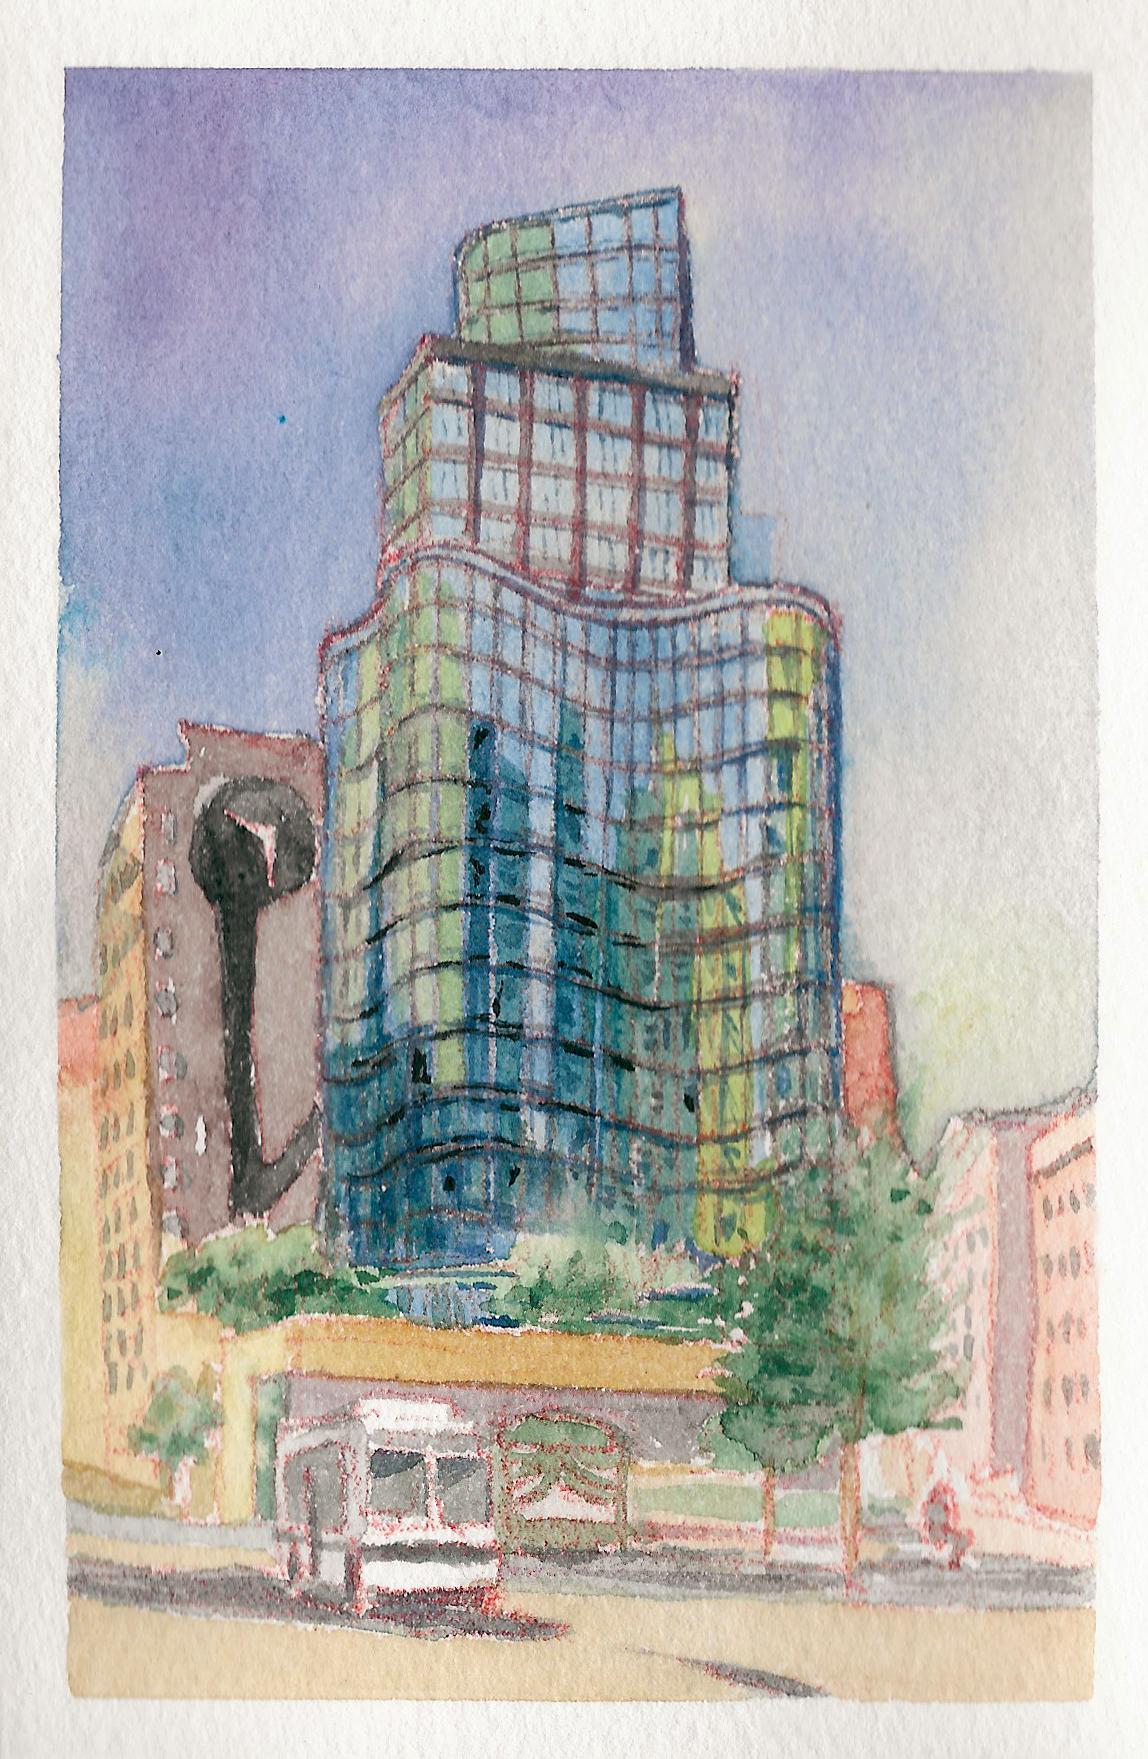 nyc sketchbook-33 Cooper Tower.png